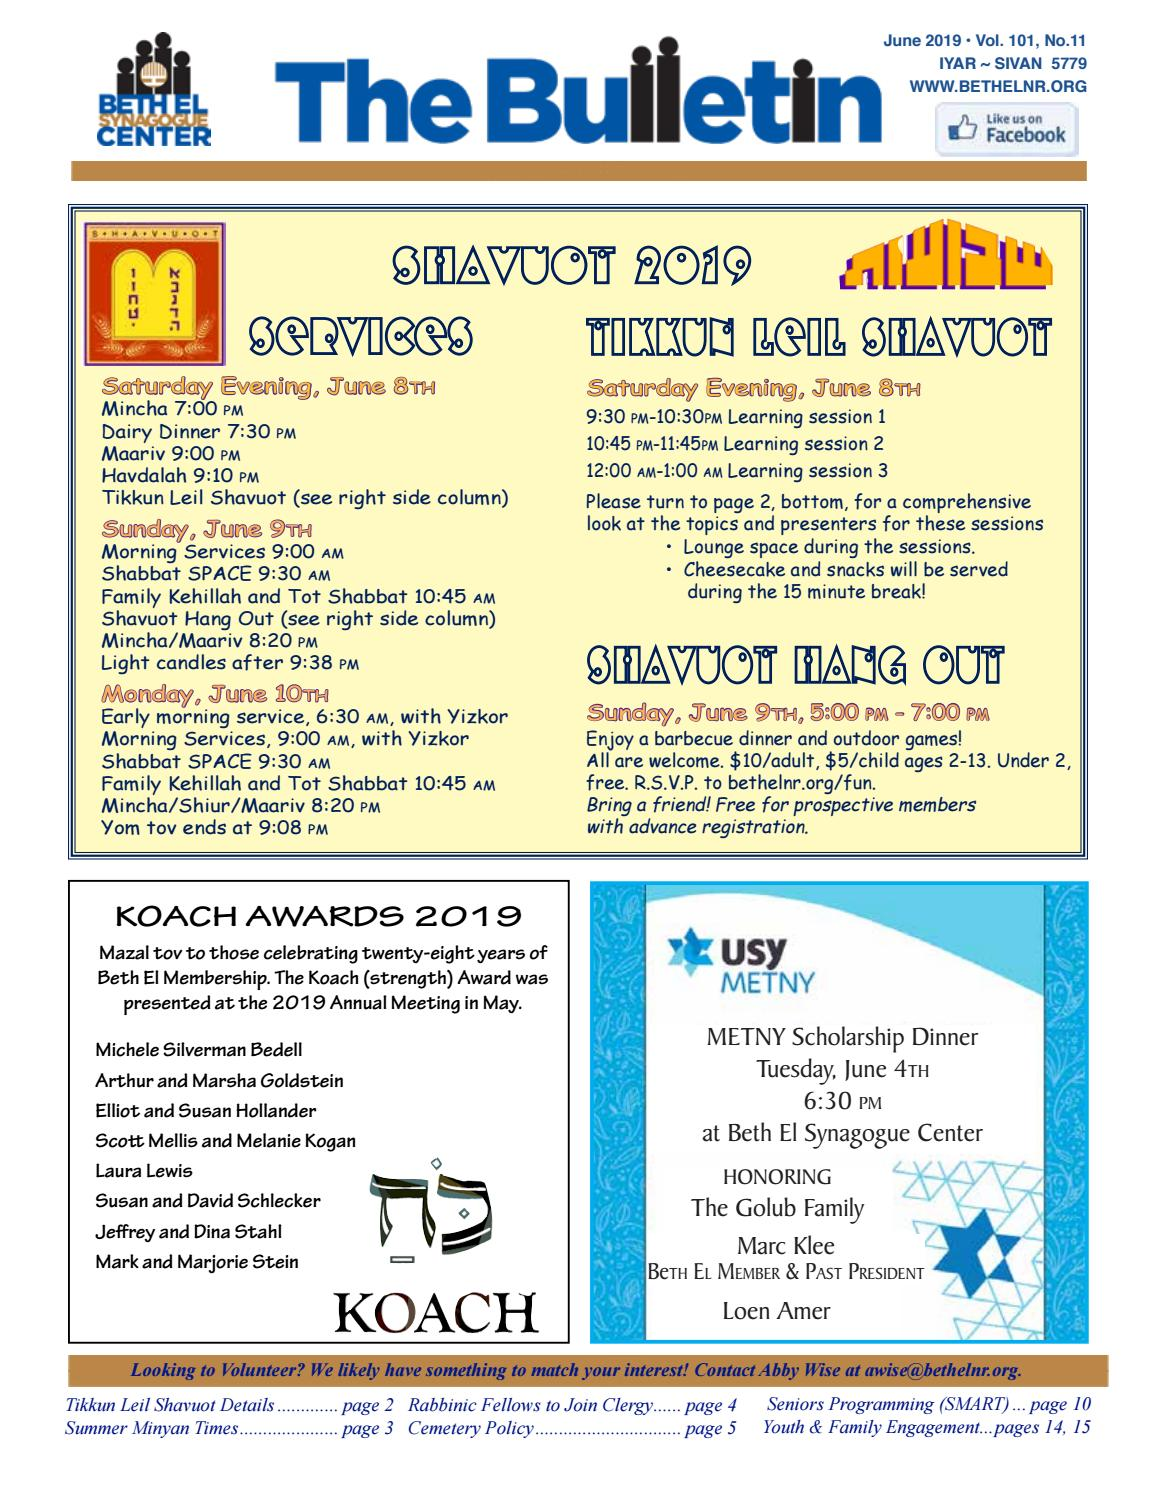 June 19 Bulletin By Beth El Synagogue Center Issuu